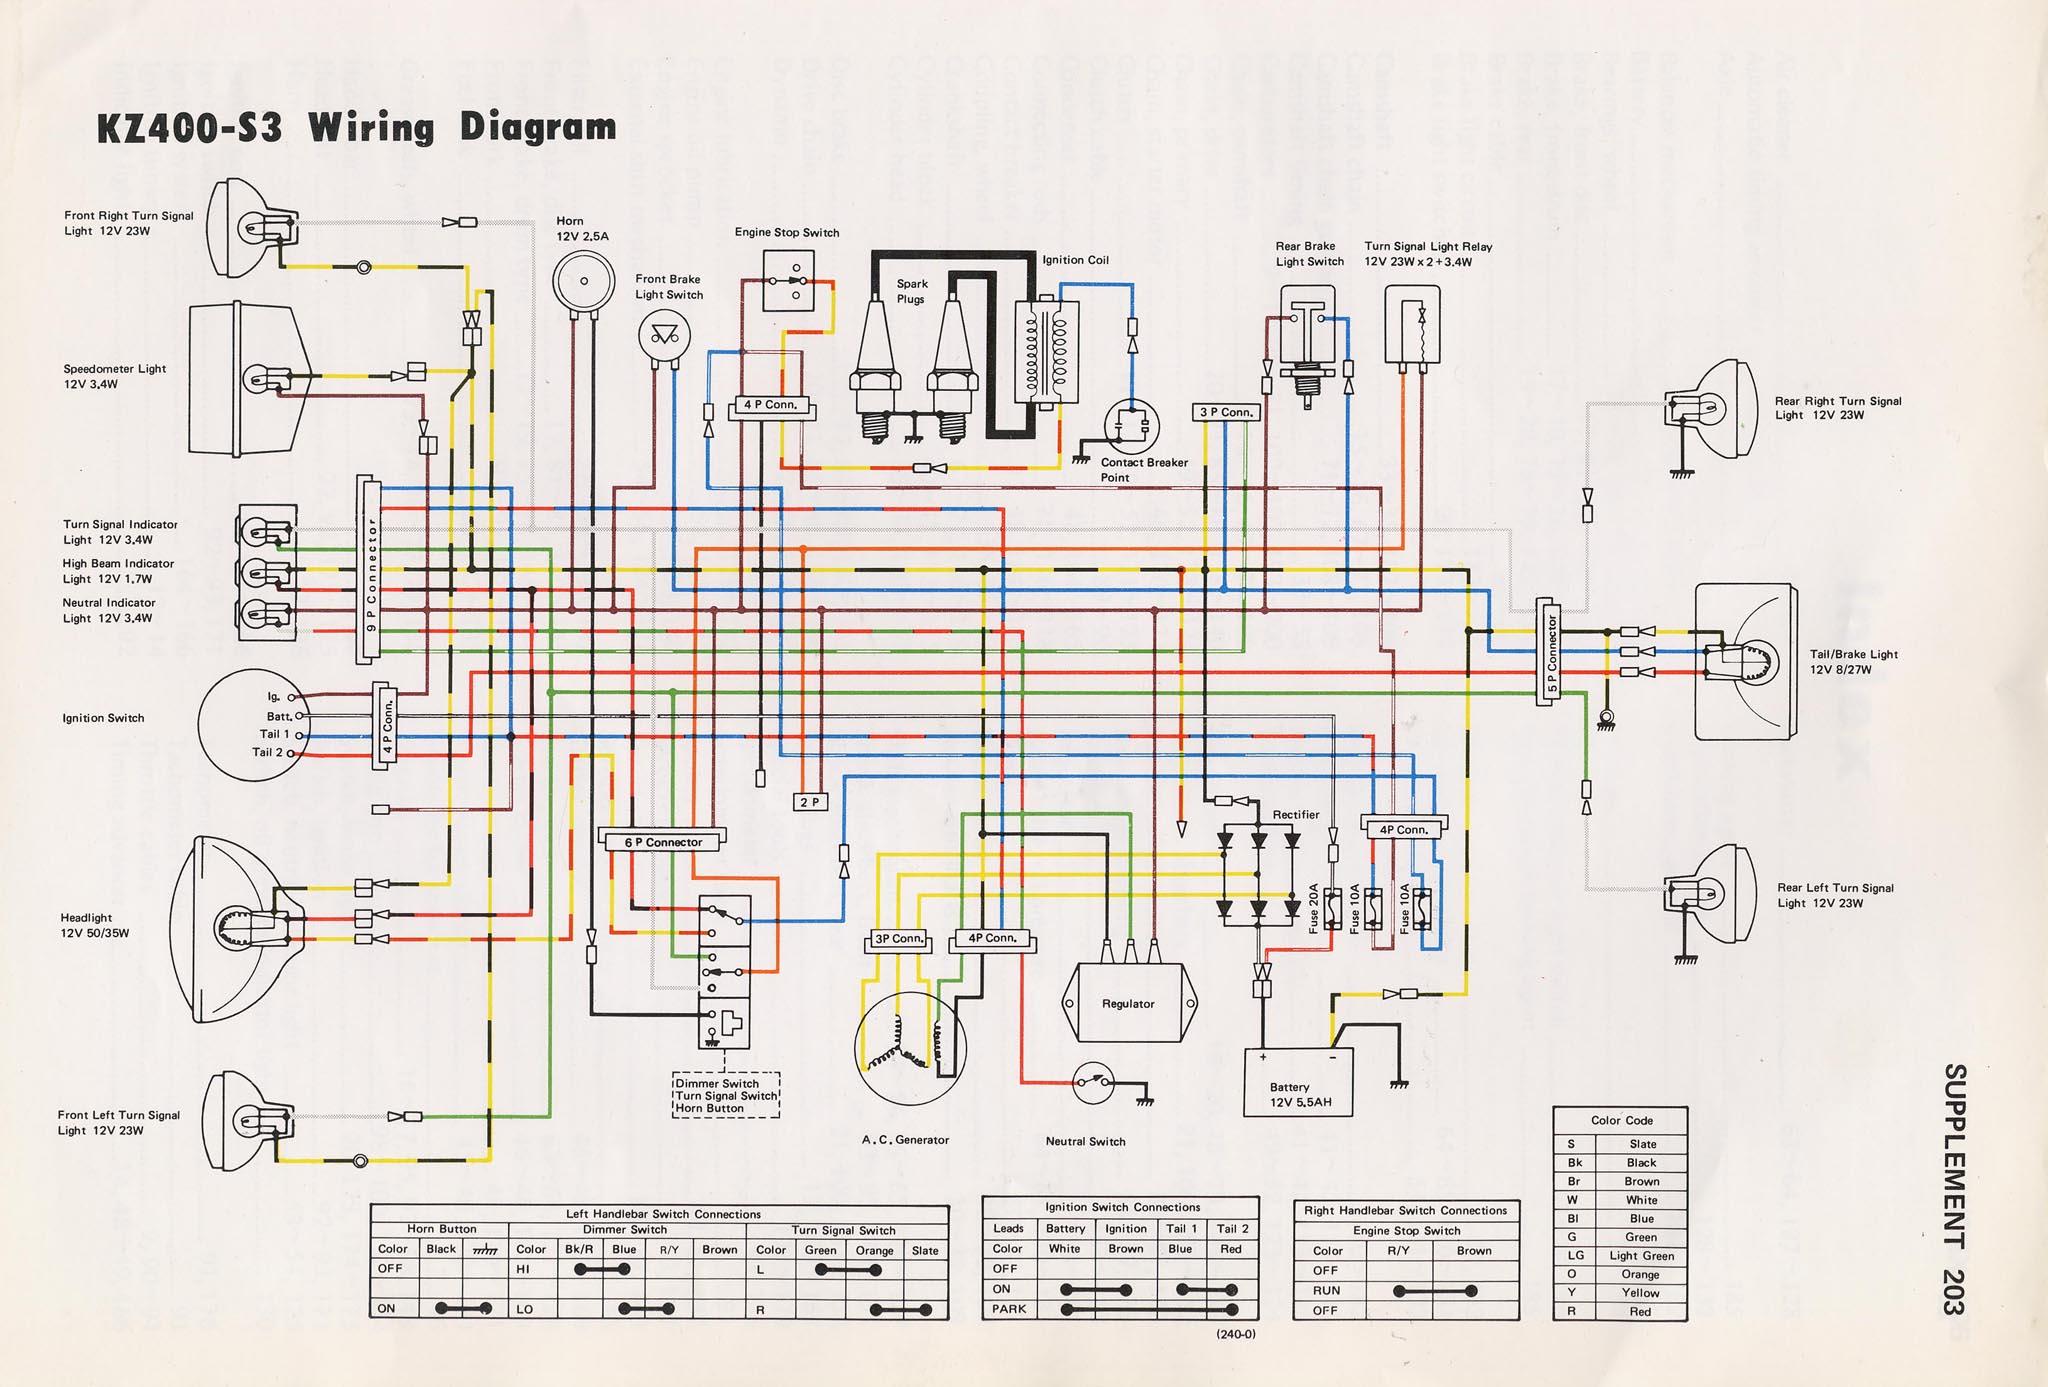 diagram database - just the best diagram database website  xdiagramdentistx.desratsworld.co.uk